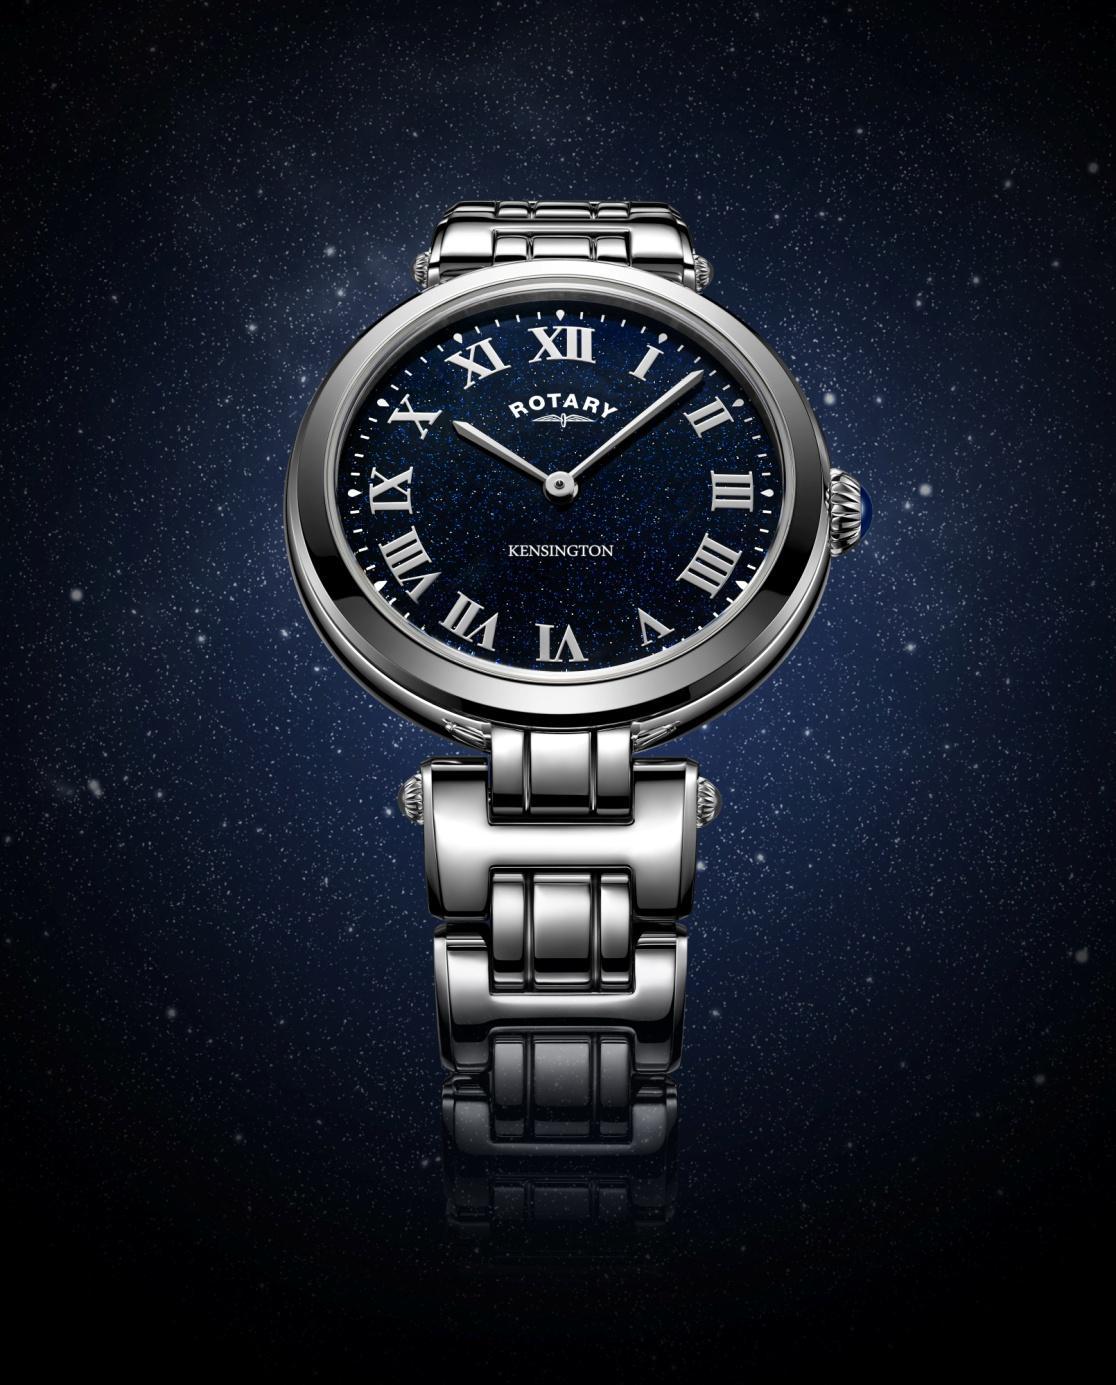 rotary kensington watch